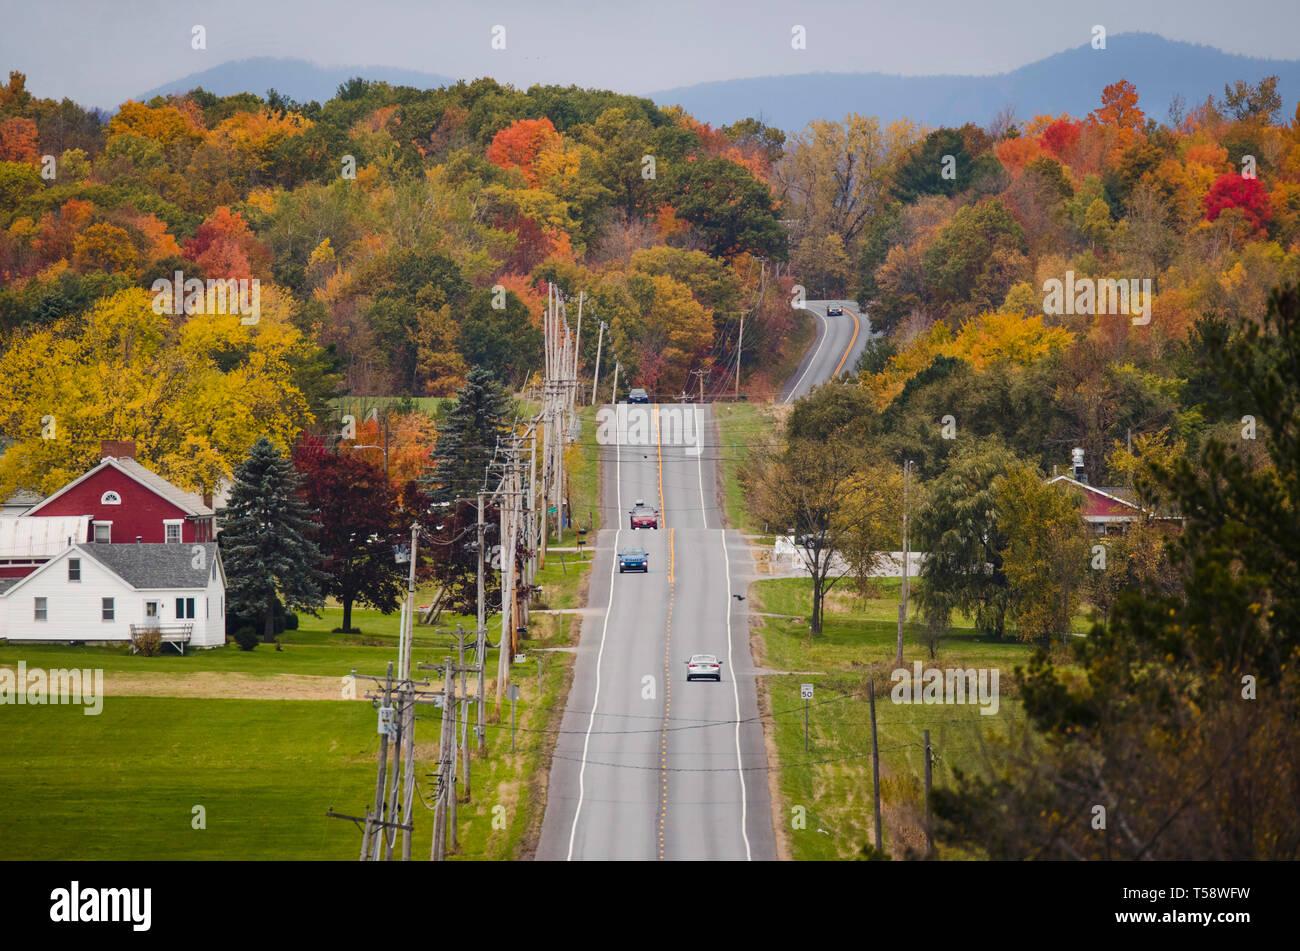 Fall foliage scene along Rt 7 near  Middlebury, Vt, USA - Stock Image